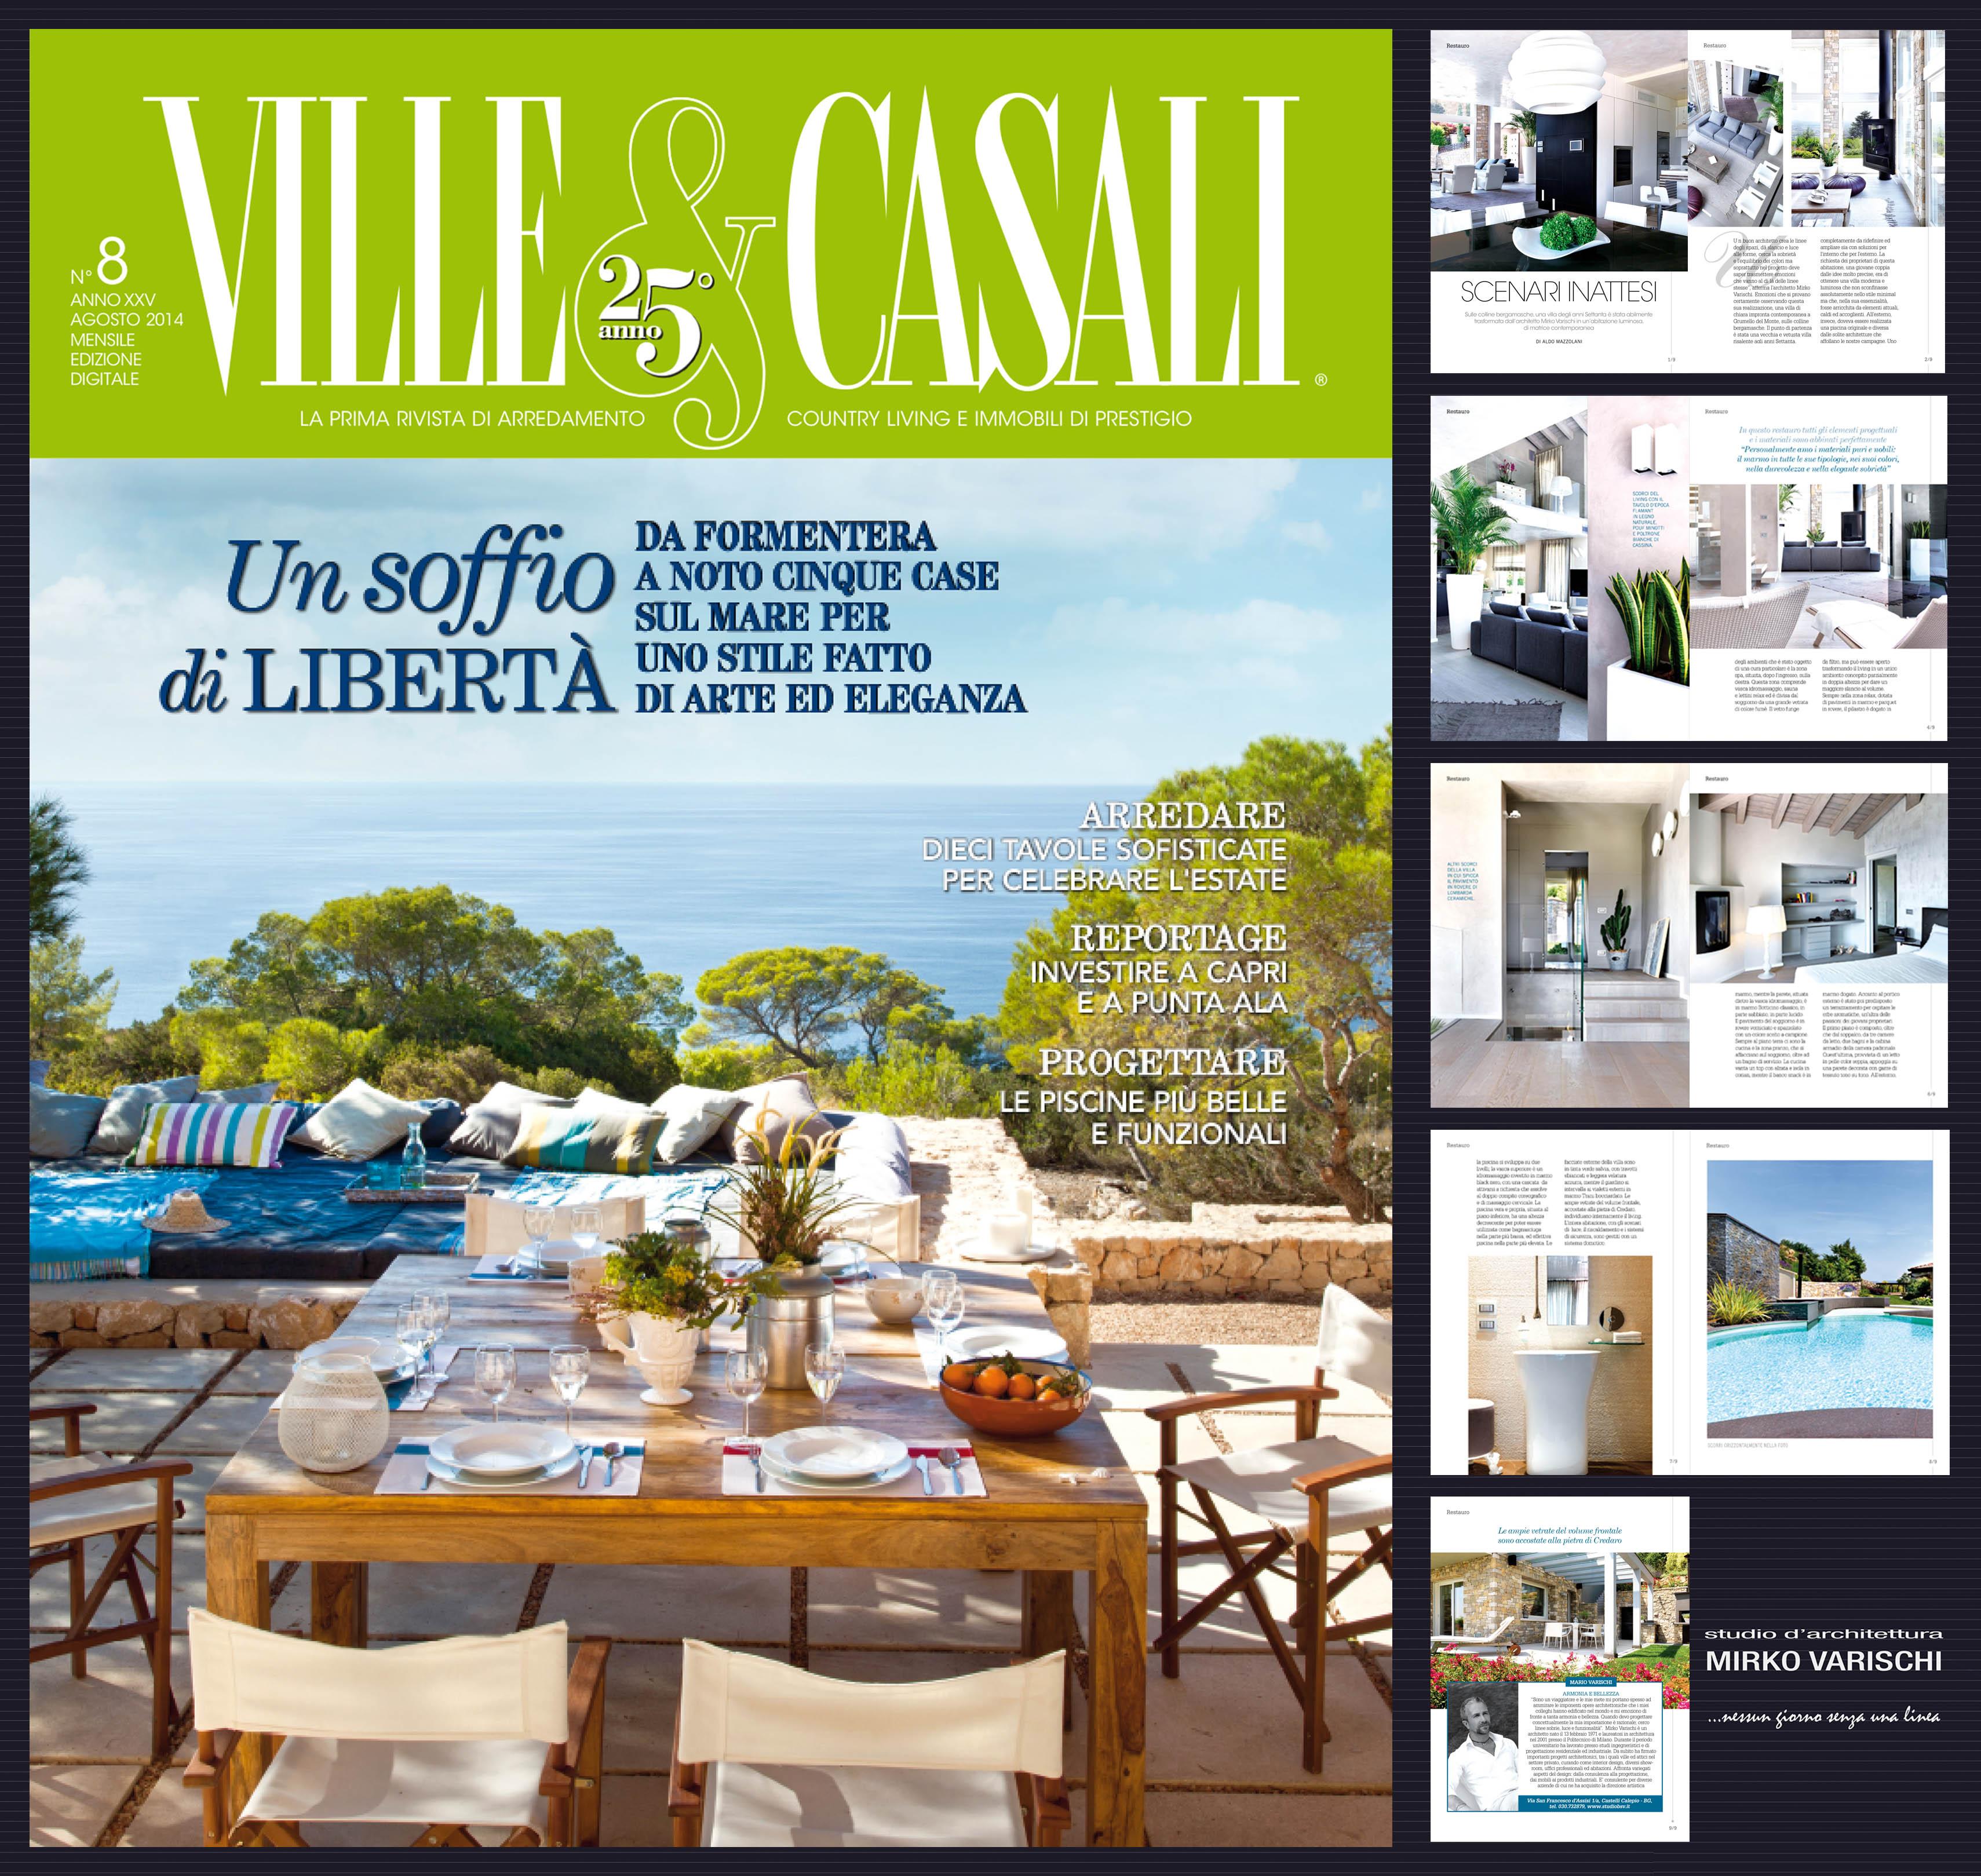 2014_08_Ville&Casali